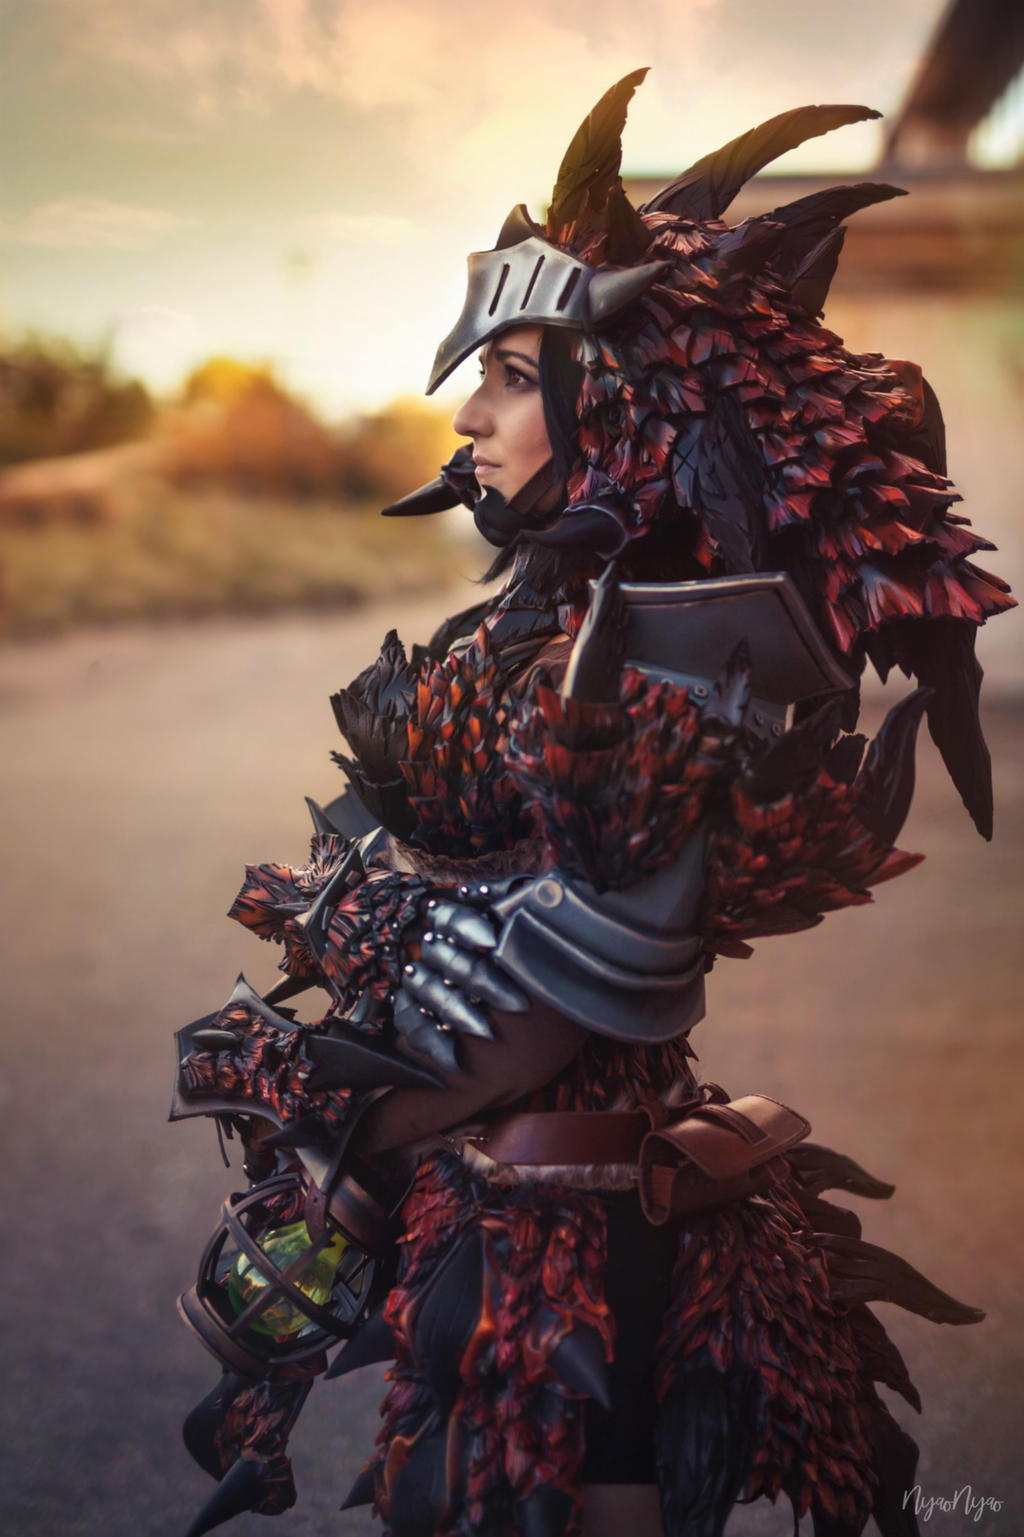 Rathalos Armor Monster Hunter World By Ellothin On Deviantart